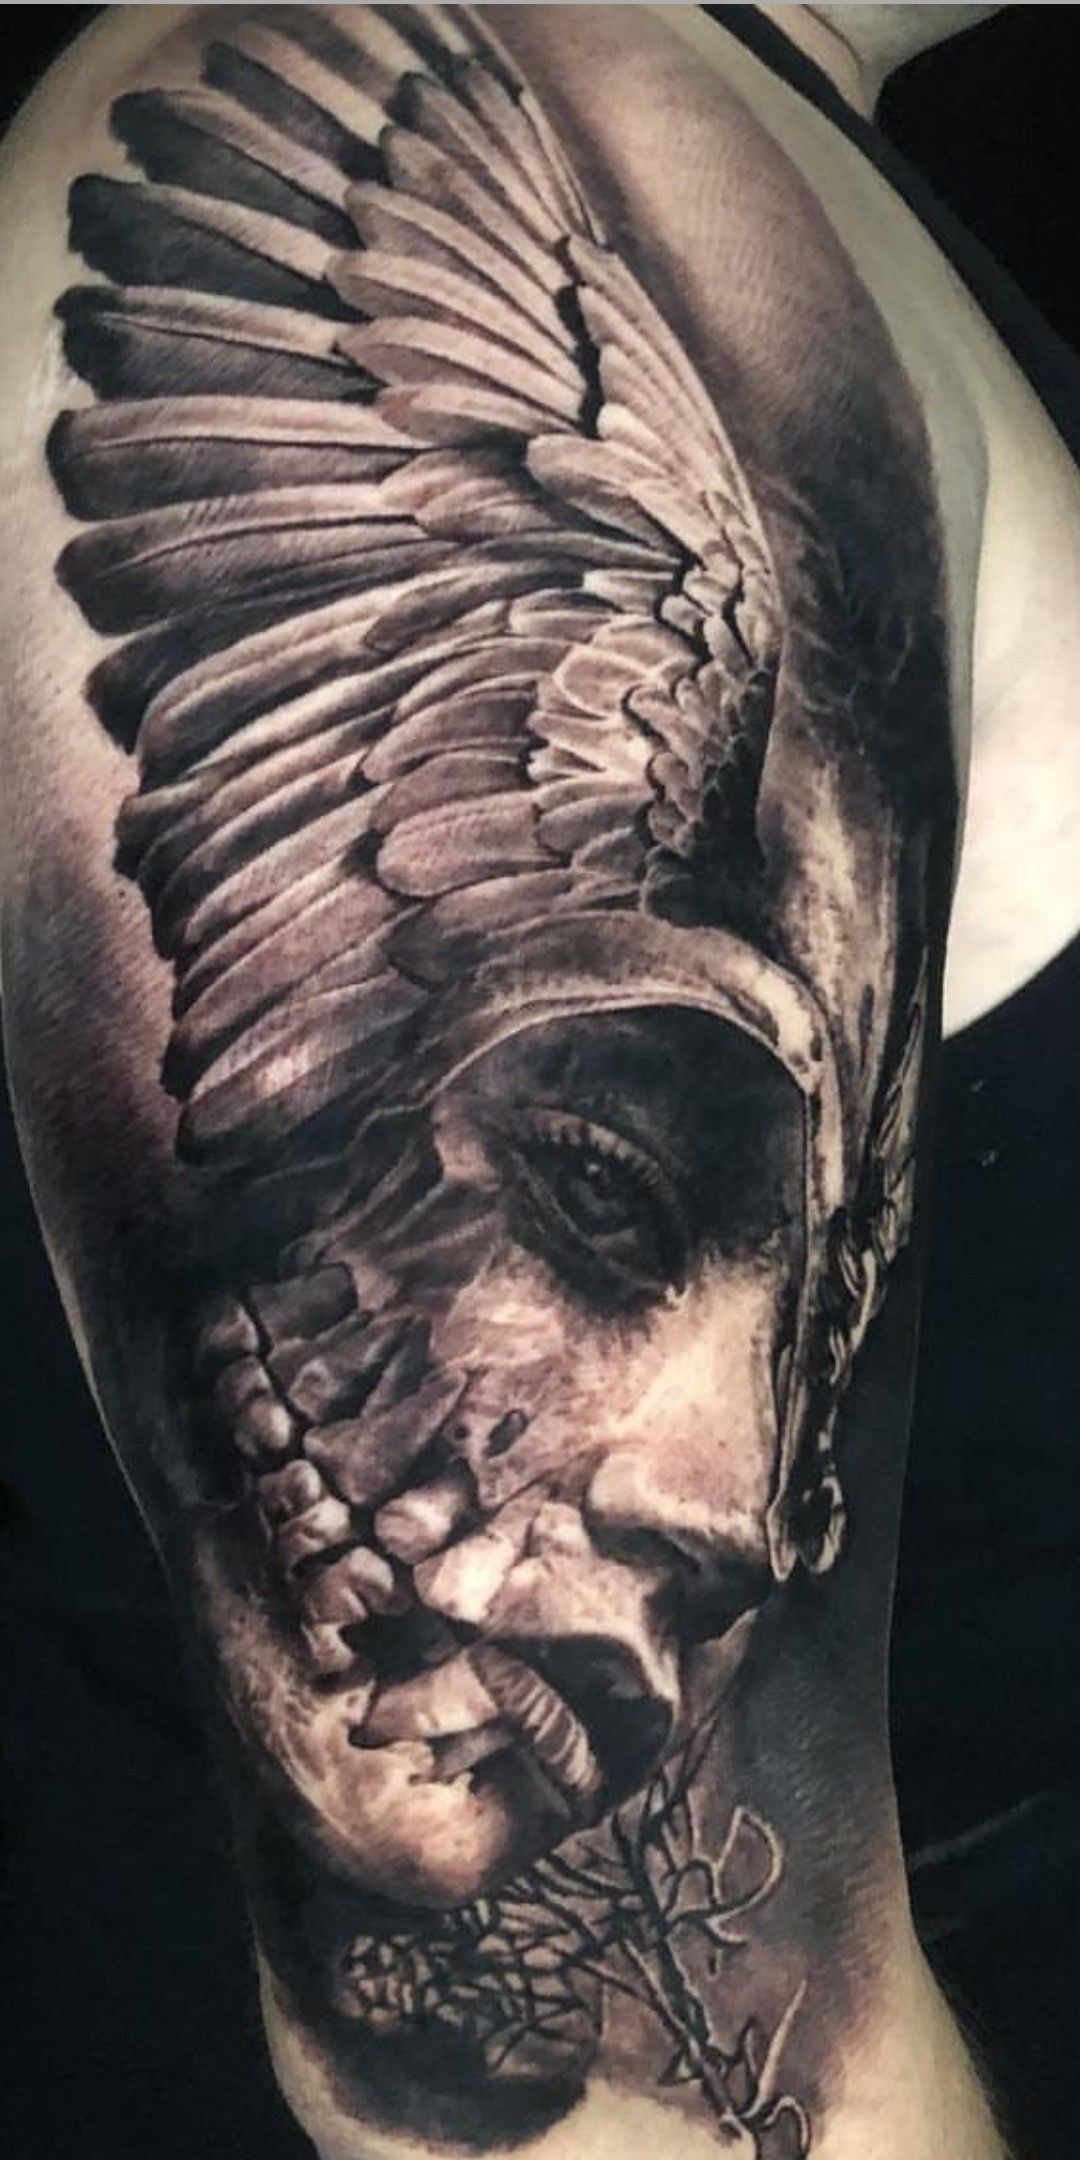 Valkyrie walküre tattoo vorlagen / top 57 valkyrie tattoo. Pin de Przemyslaw Kaźmierczak em Tattoos   Tatuagem manga